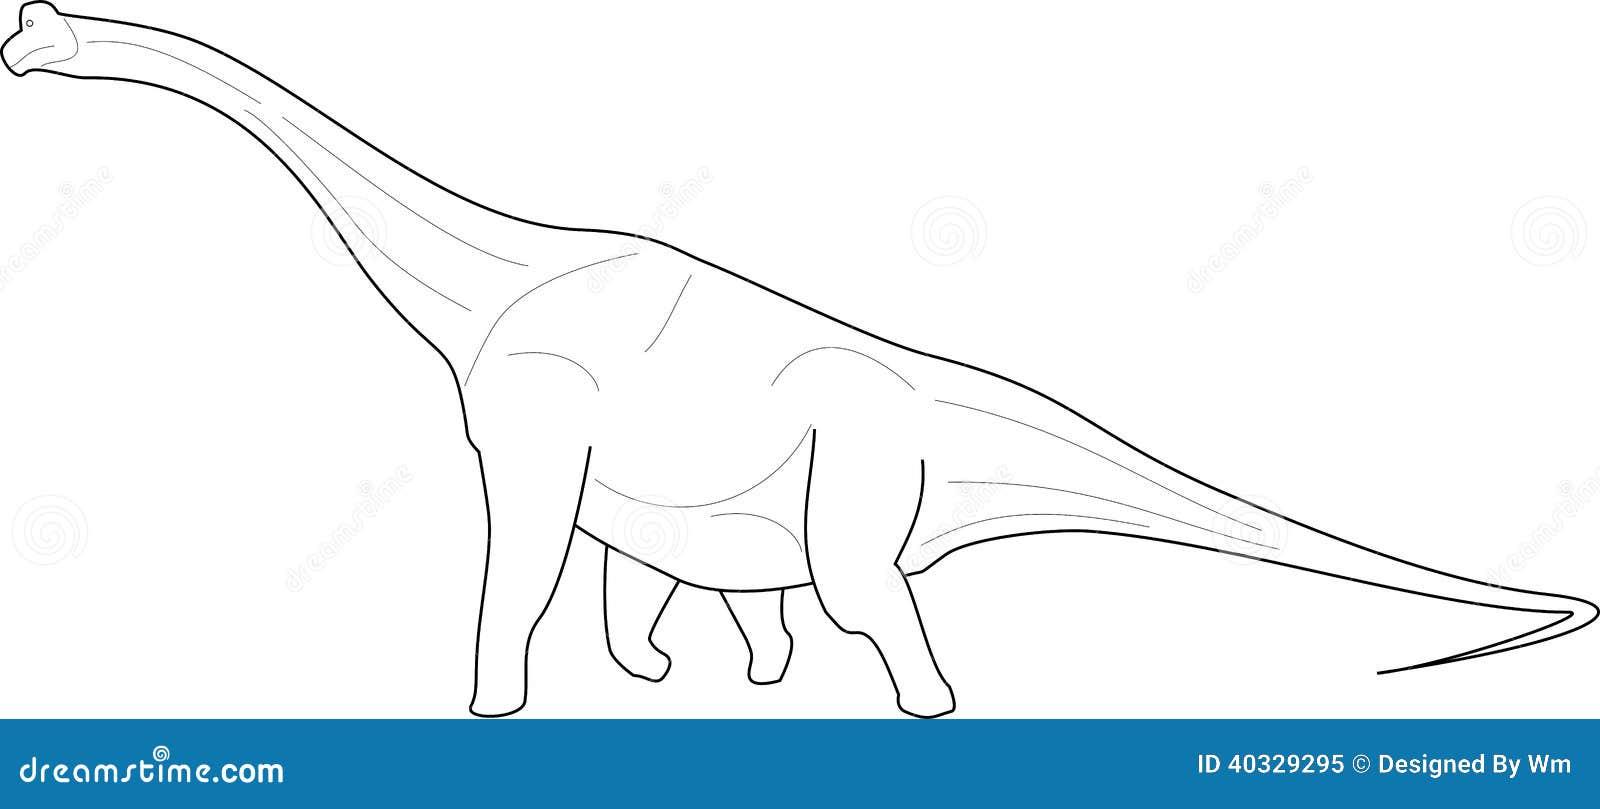 Line Art Dinosaur : Diplodocus line art stock vector illustration of drawn